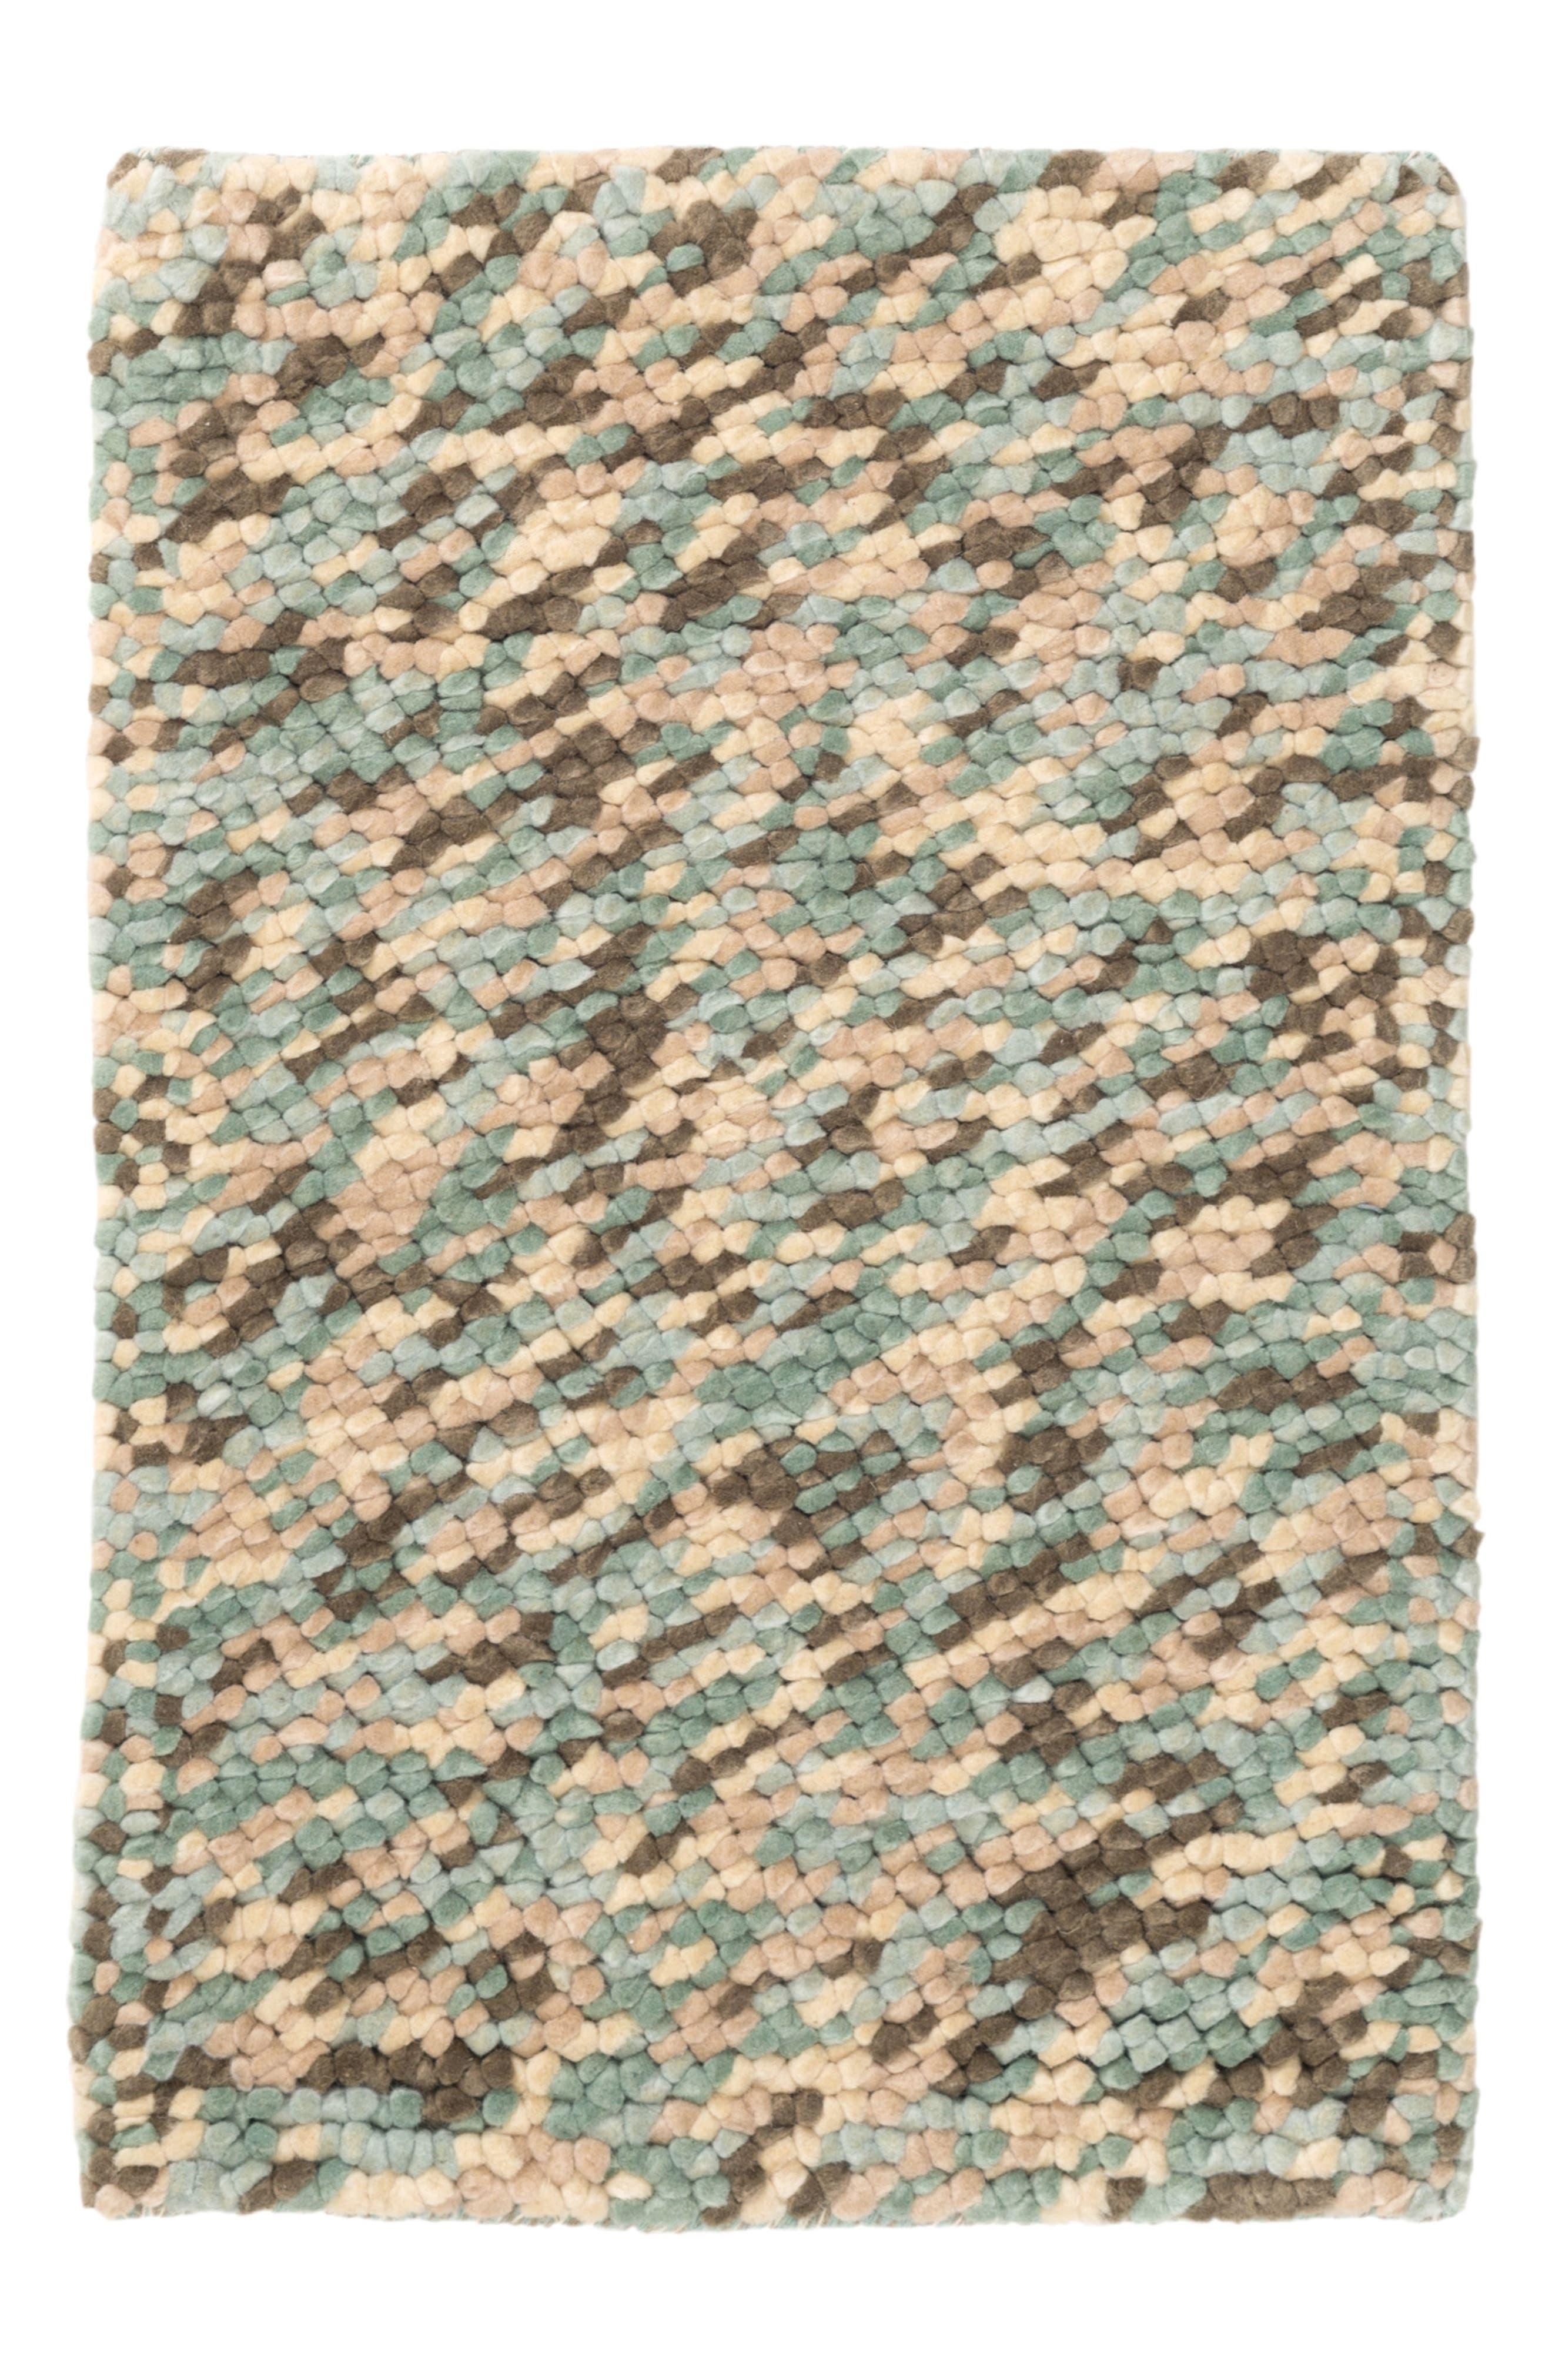 Seurat Seaglass Wool Rug,                         Main,                         color, Blue